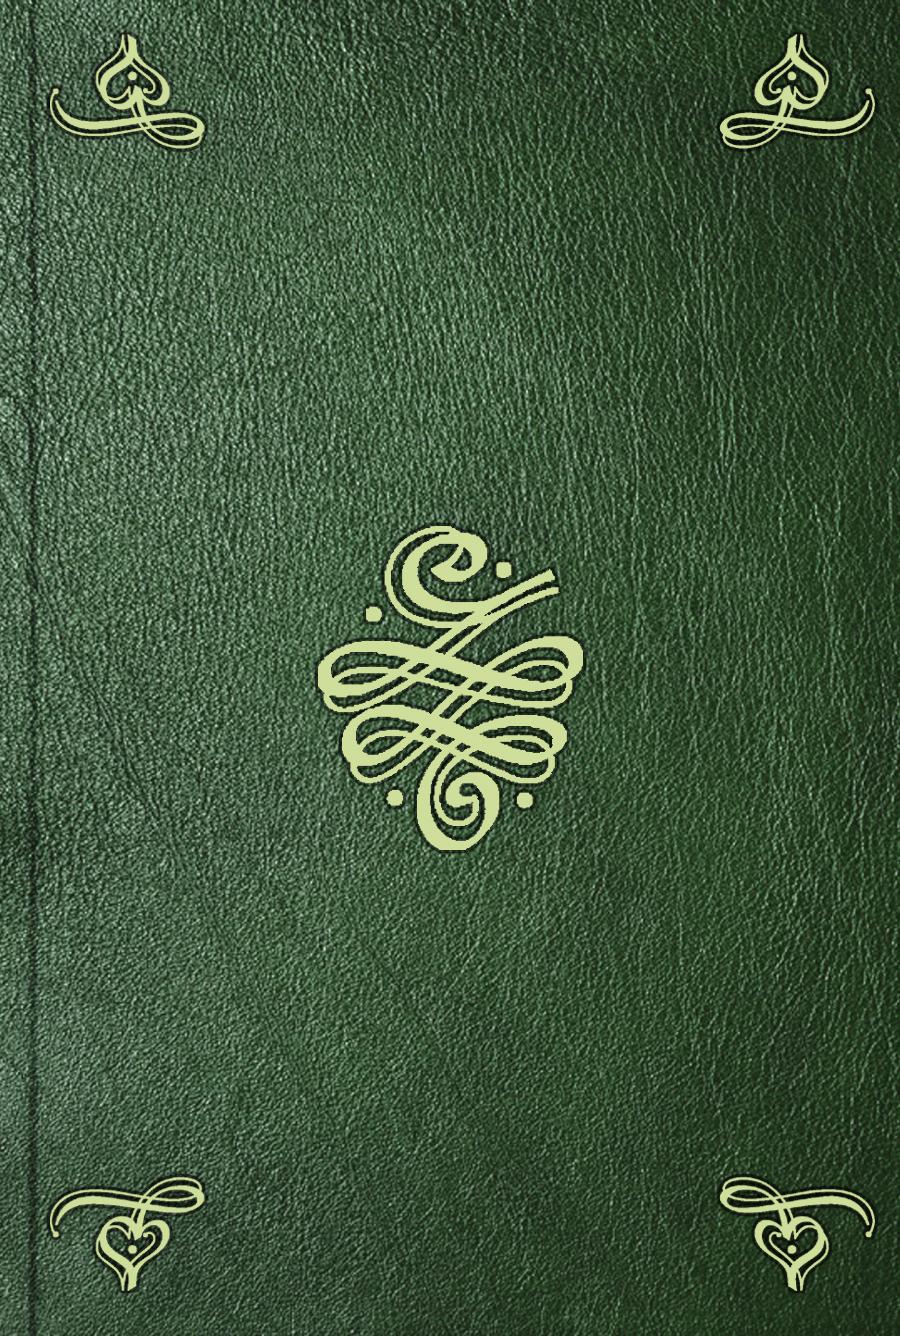 Georgical essays. Vol. 5